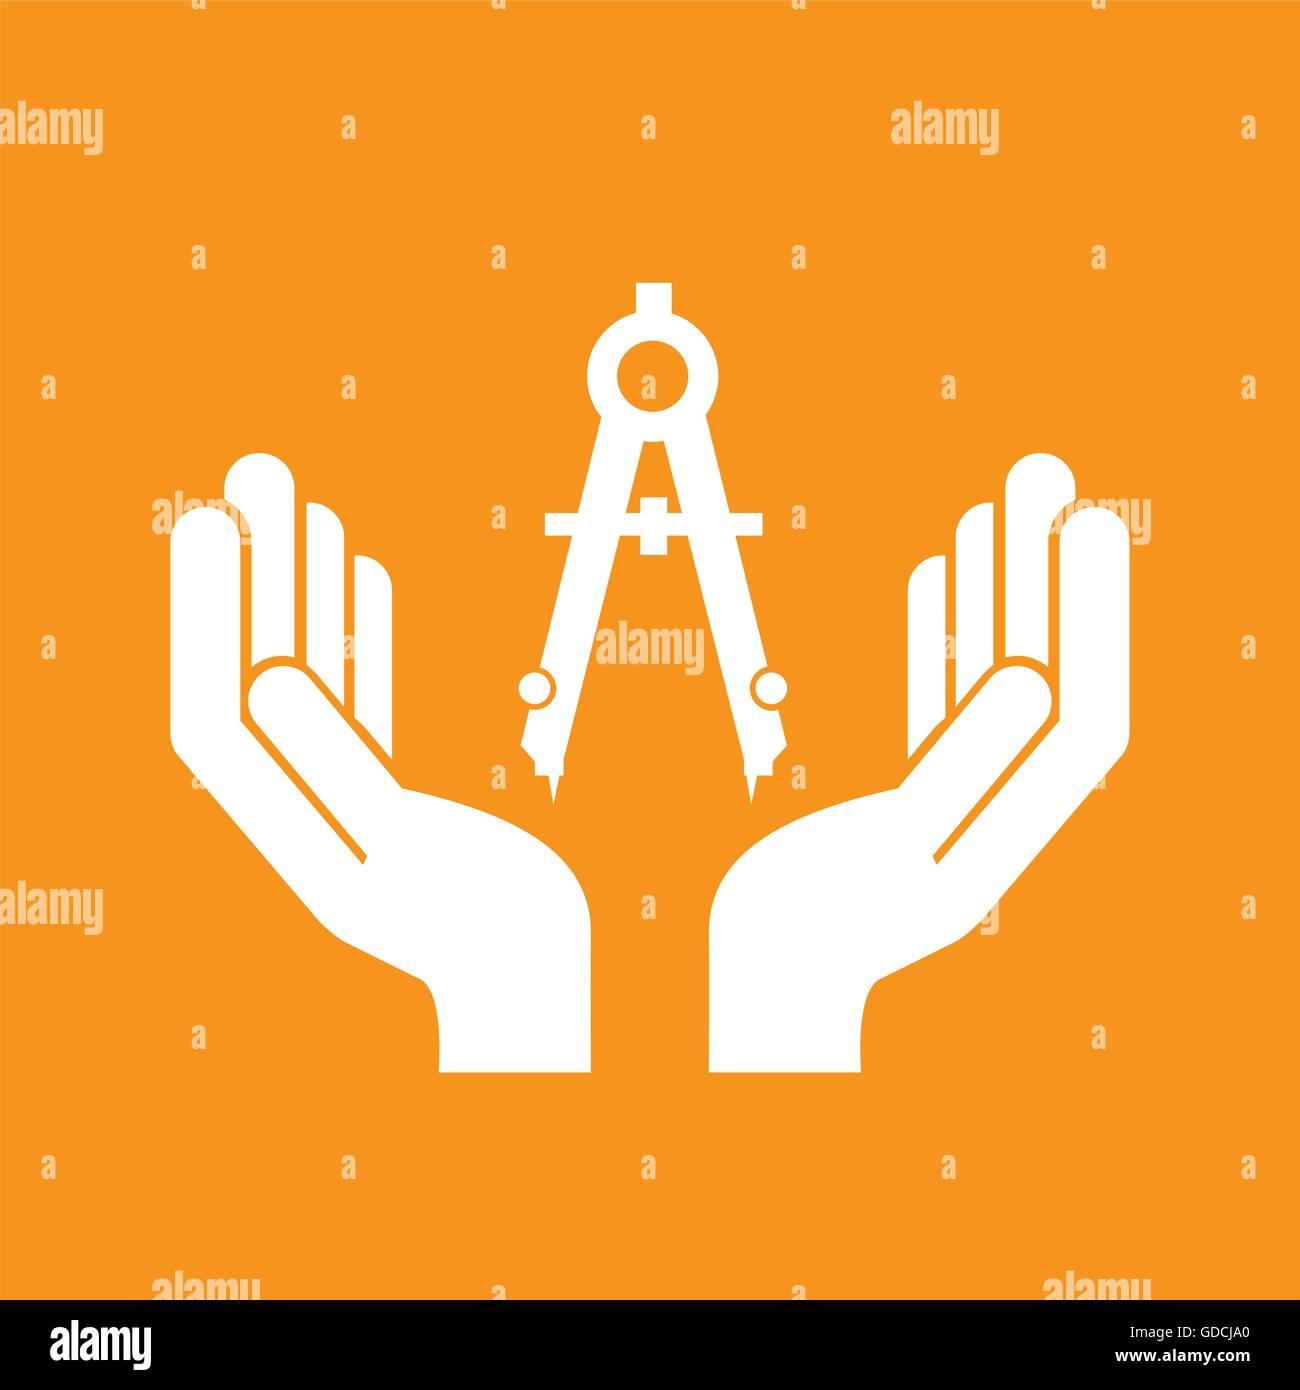 Civil Engineering Icon Stock Vector Art Illustration Vector Image